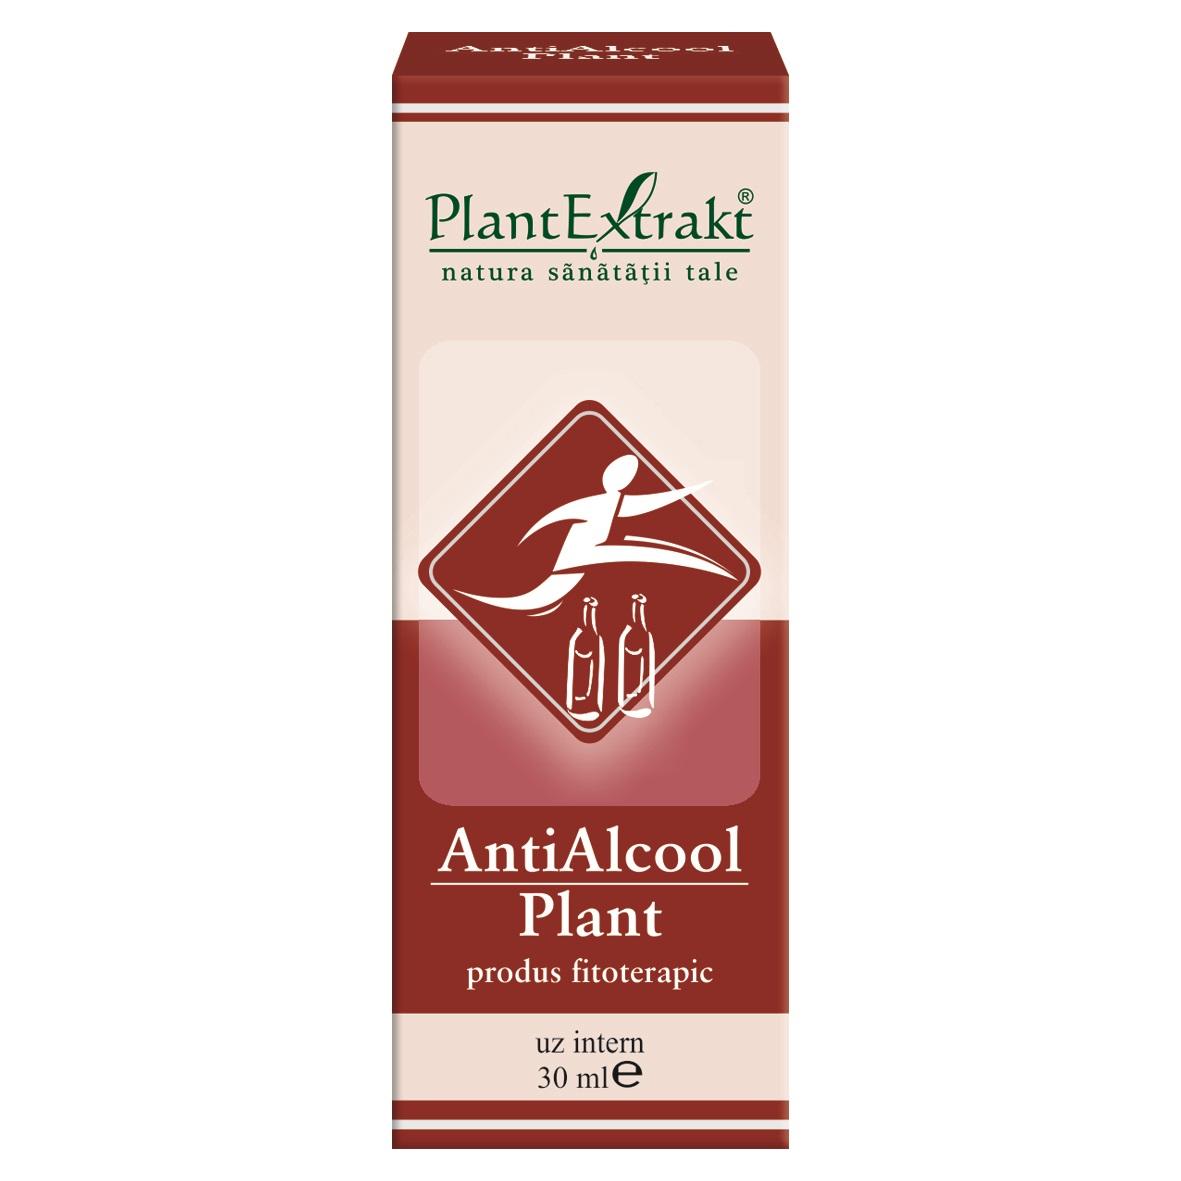 AntiAlcool Plant, 30ml, Plantextrakt imagine produs 2021